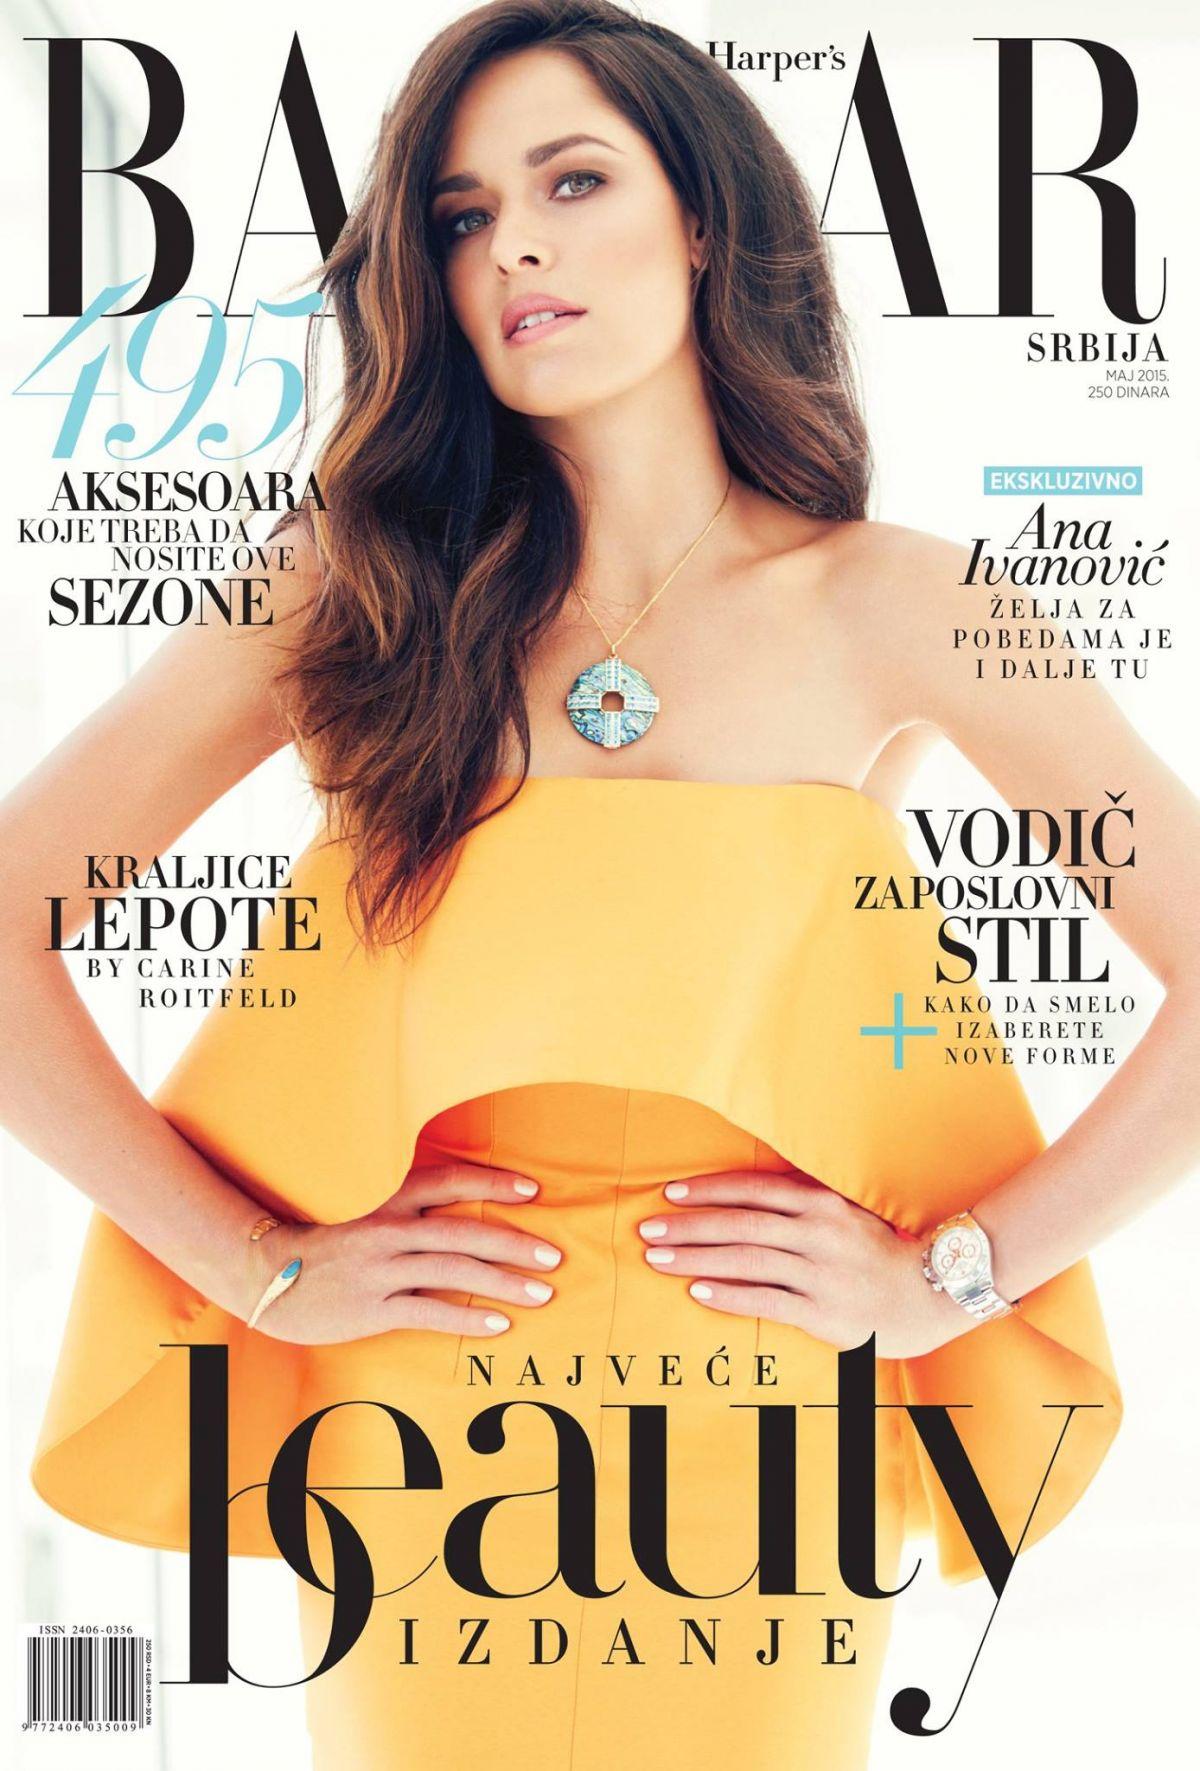 http://www.gotceleb.com/wp-content/uploads/photos/ana-ivanovic/harper-s-bazaar-serbia-cover-may-2015/Ana-Ivanovic---Harpers-Bazaar-Serbia-Cover-2015--01.jpg